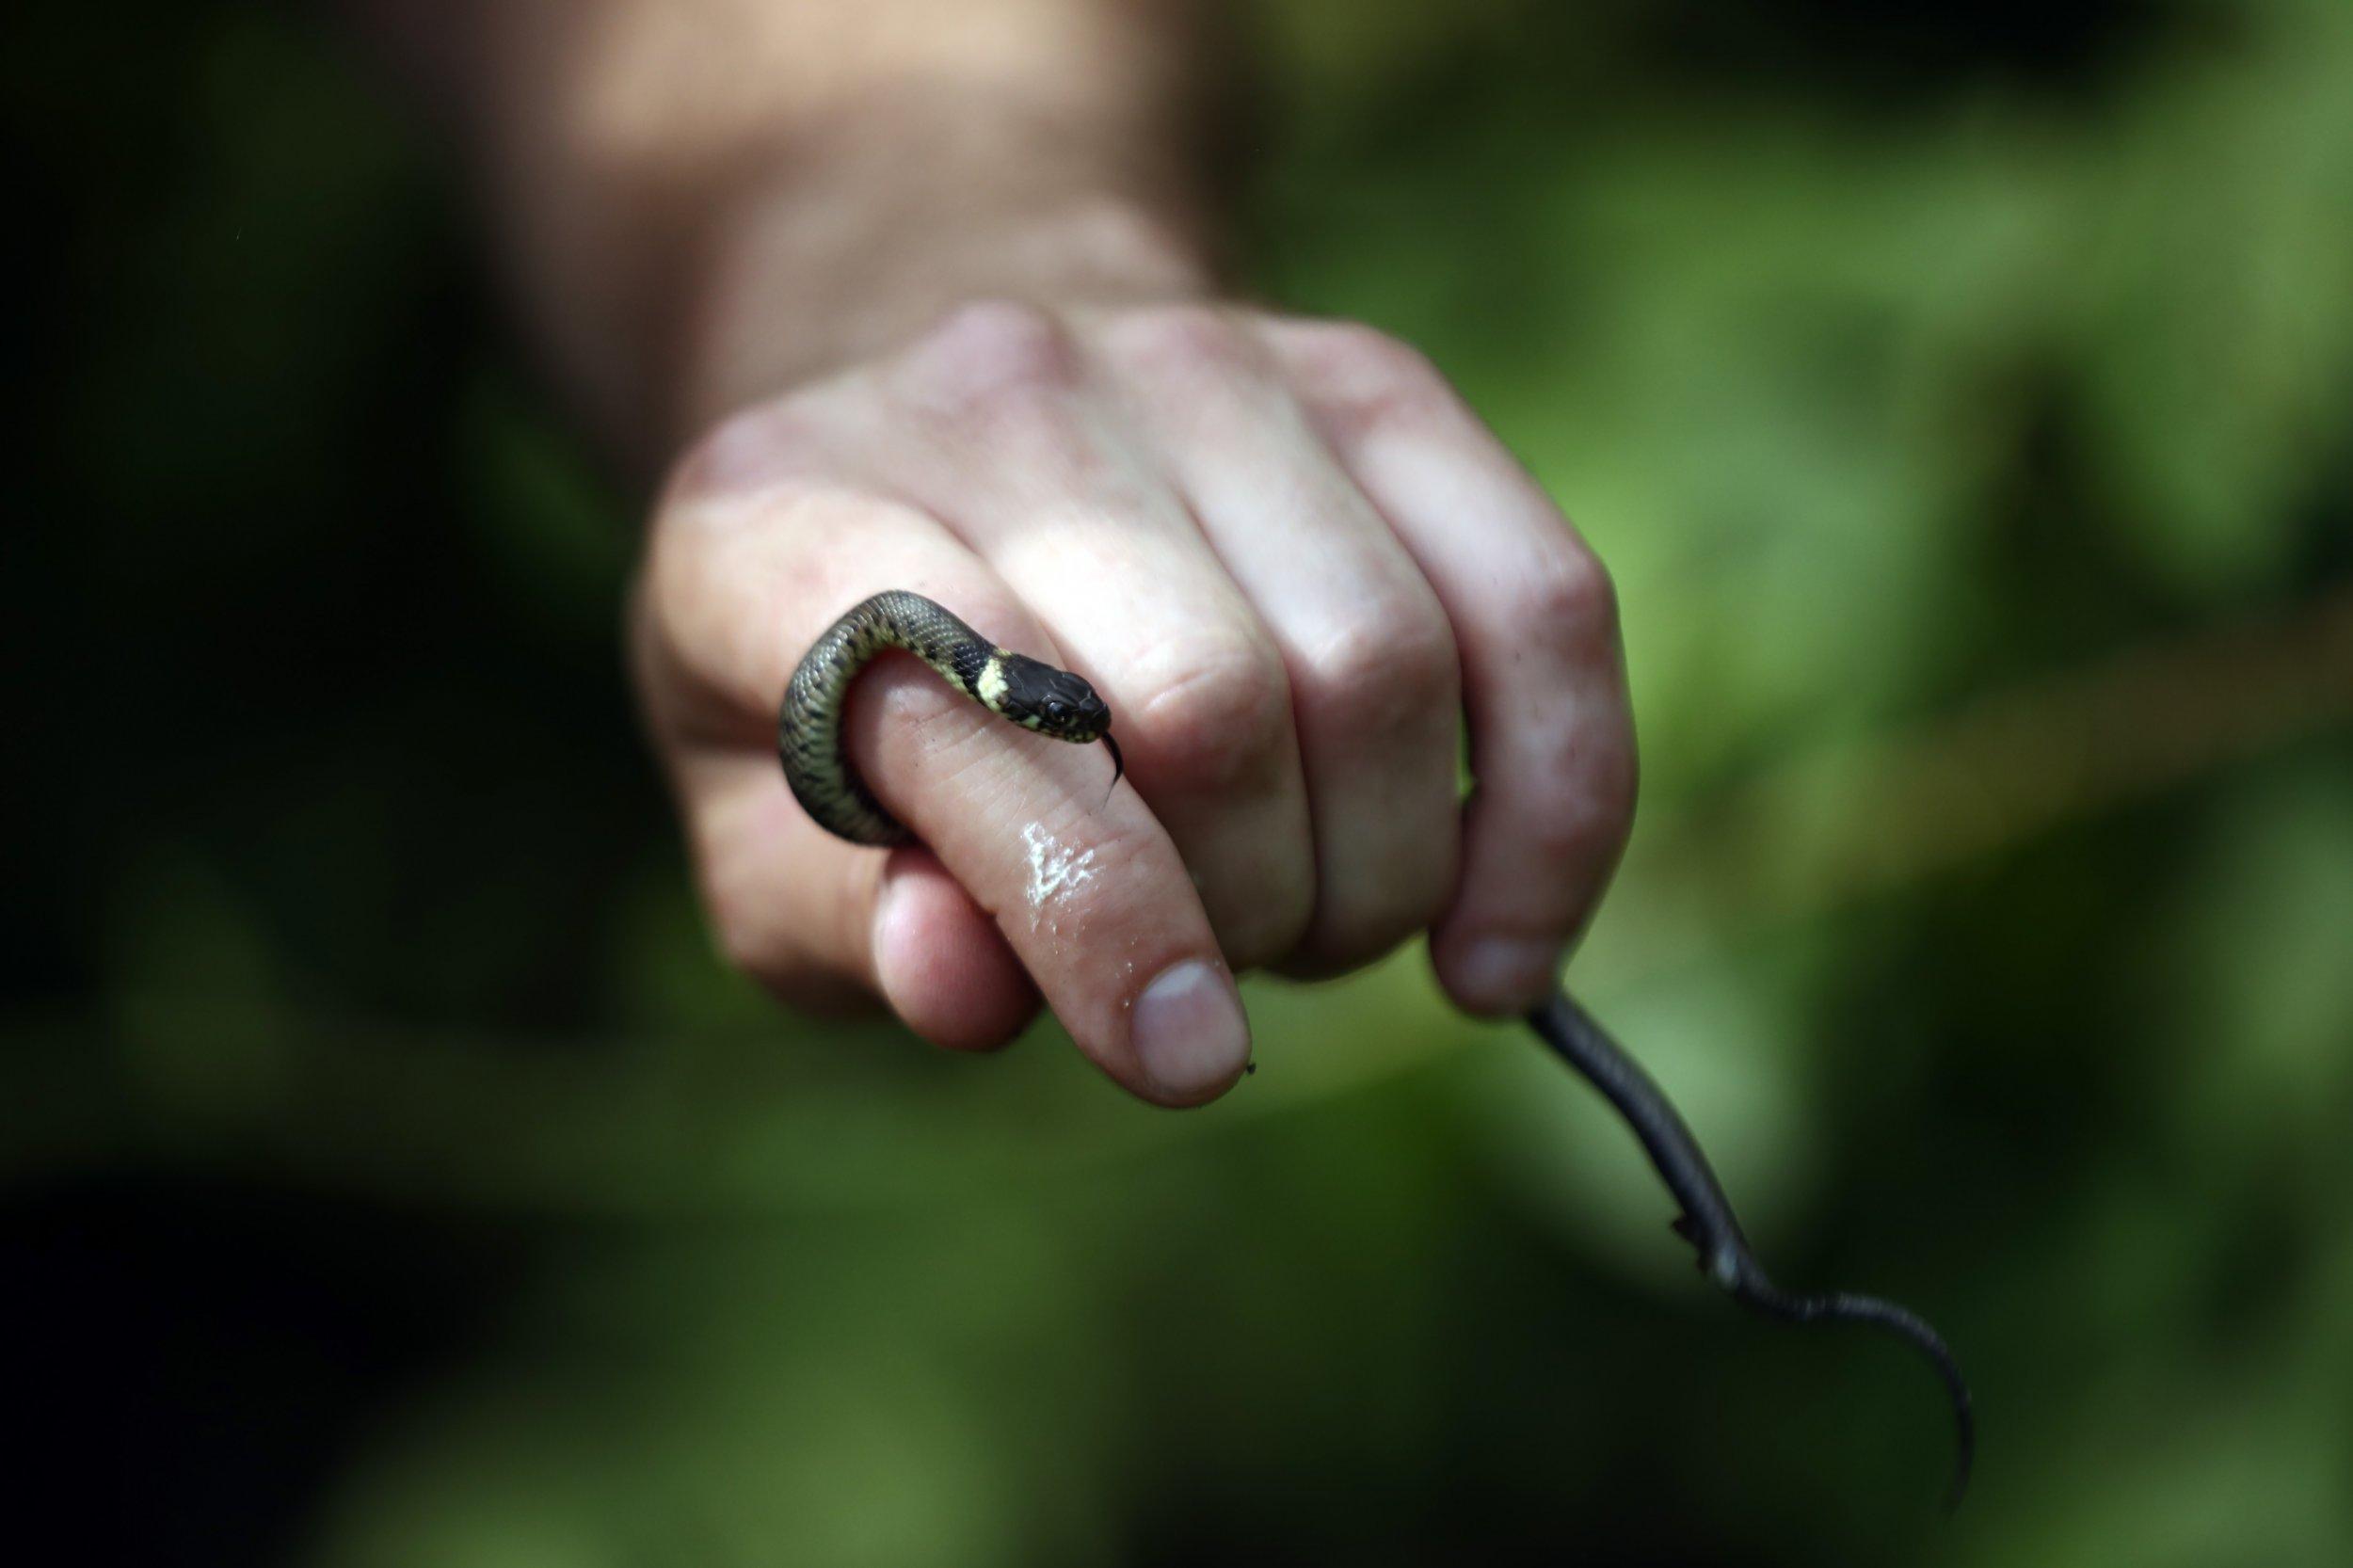 Grass snake at Hampstead Heath